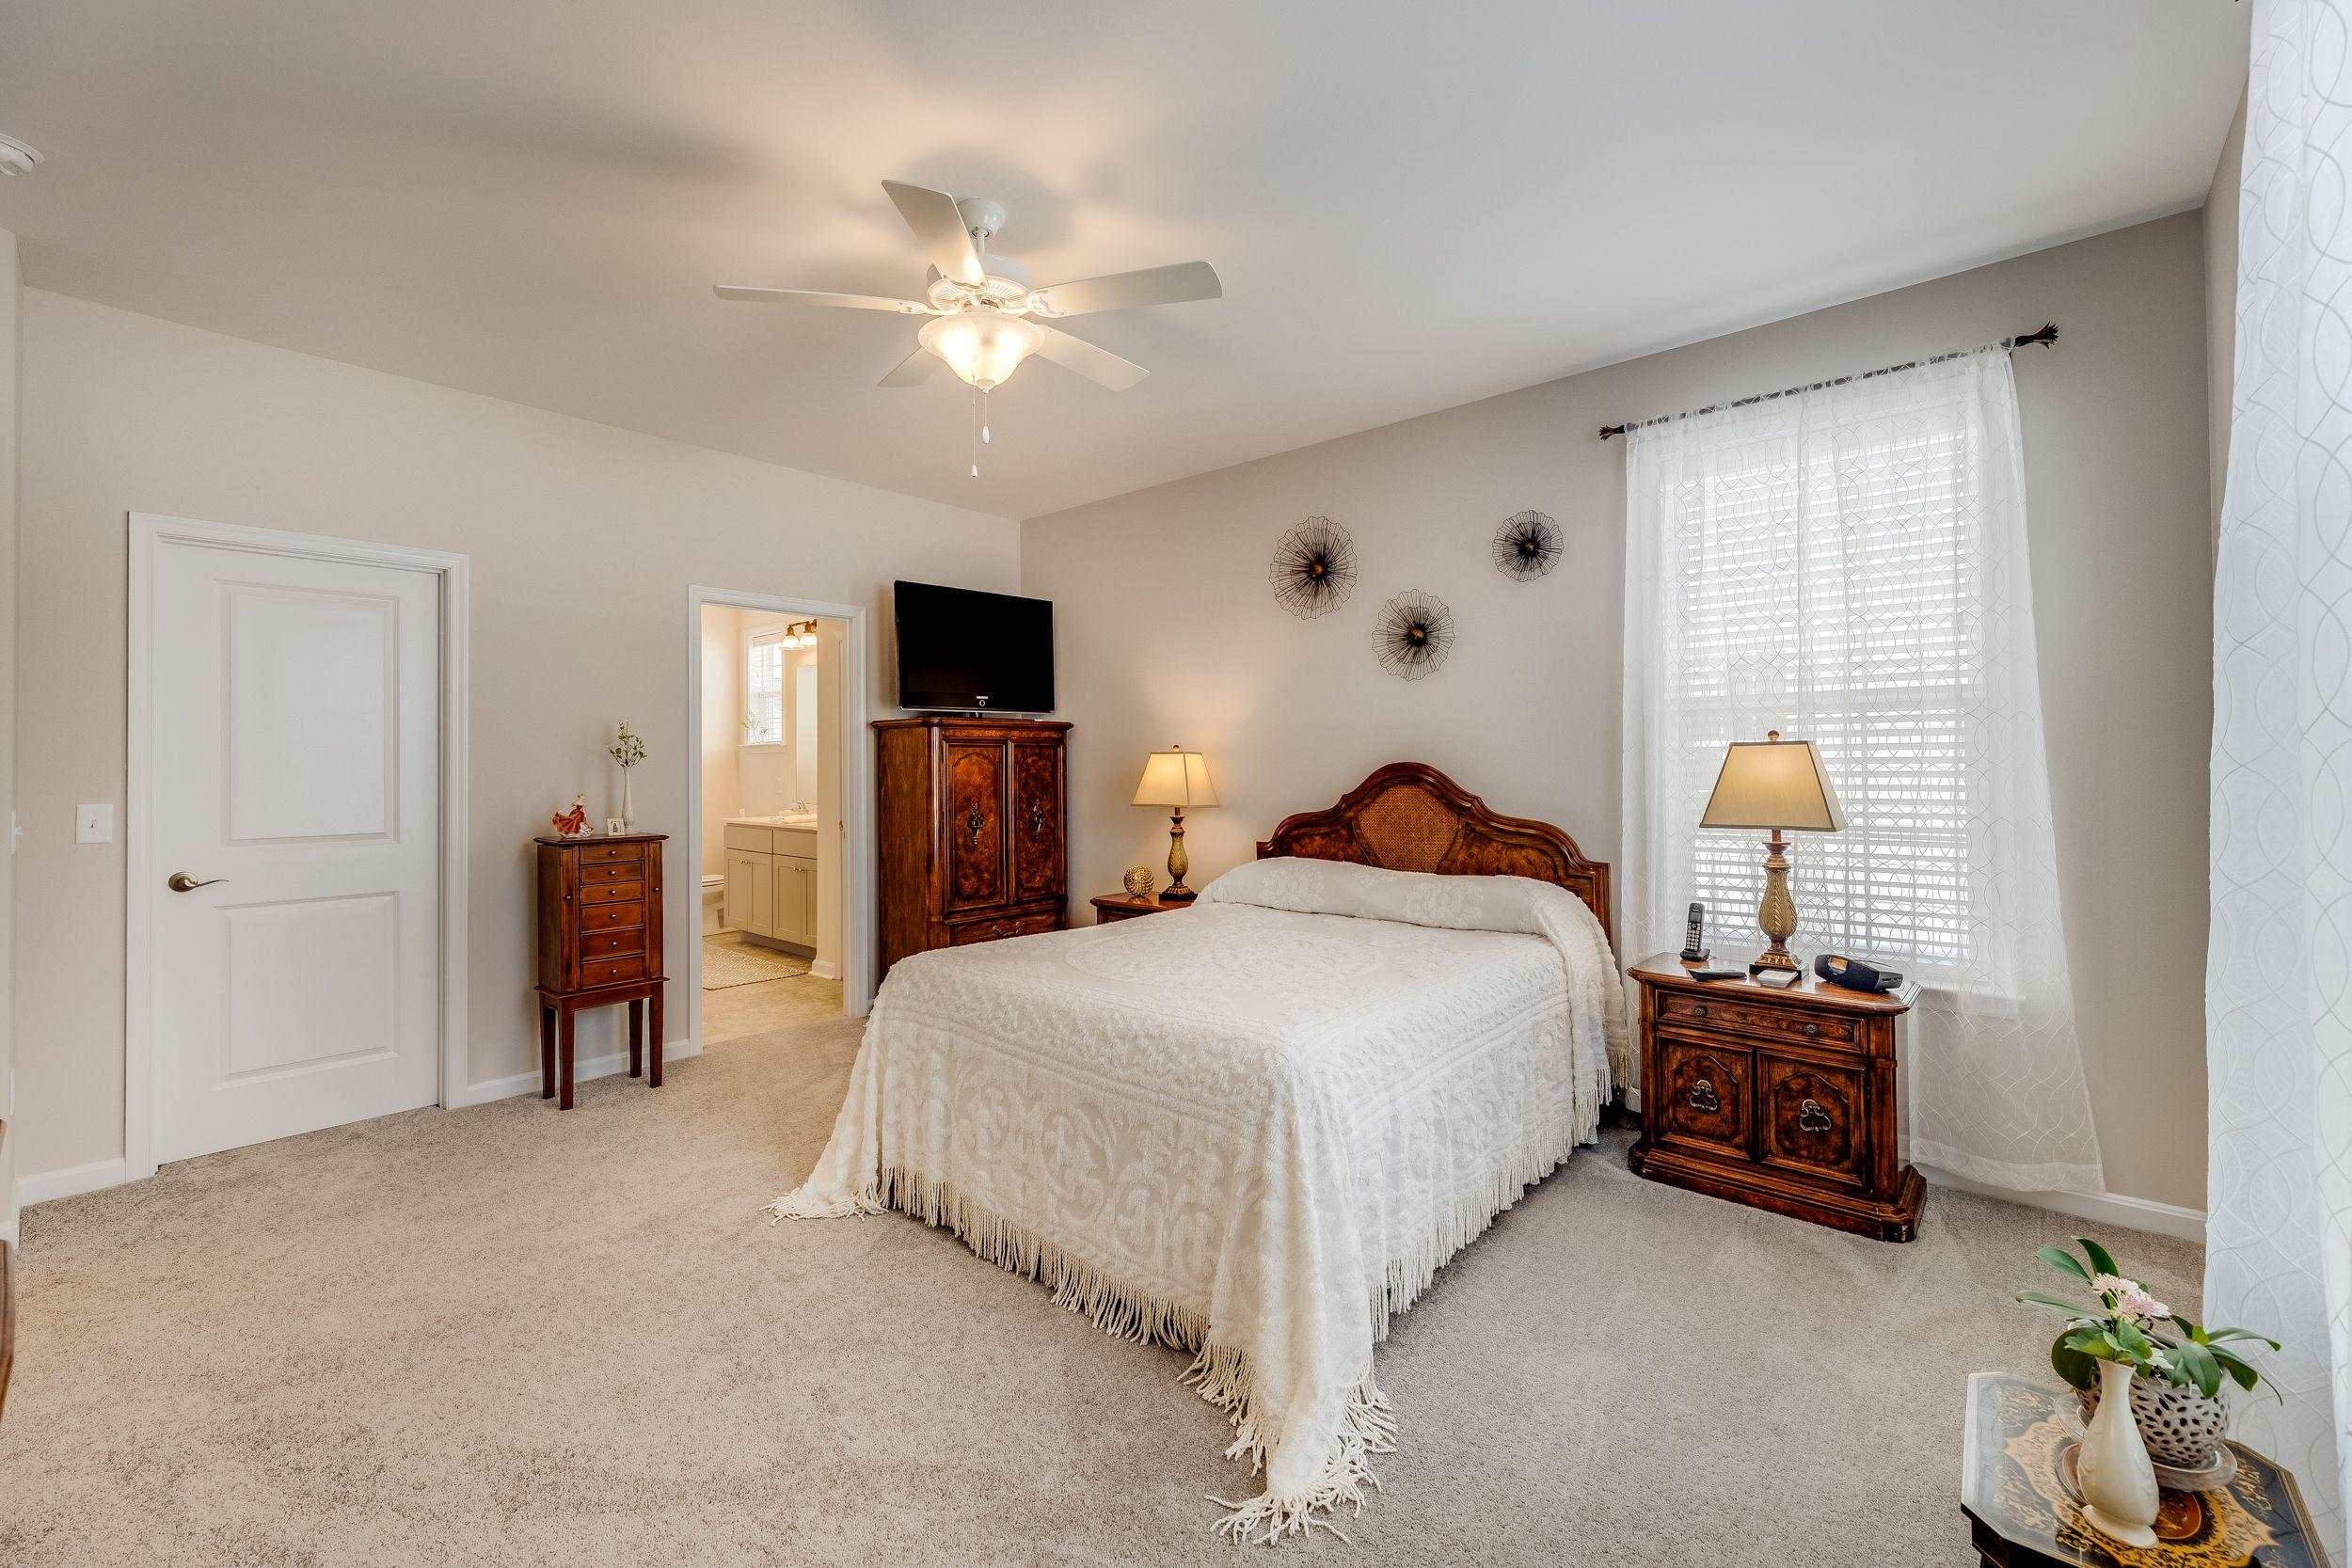 Bedroom featured in The Rosecomb II By Investors Realty in Dover, DE